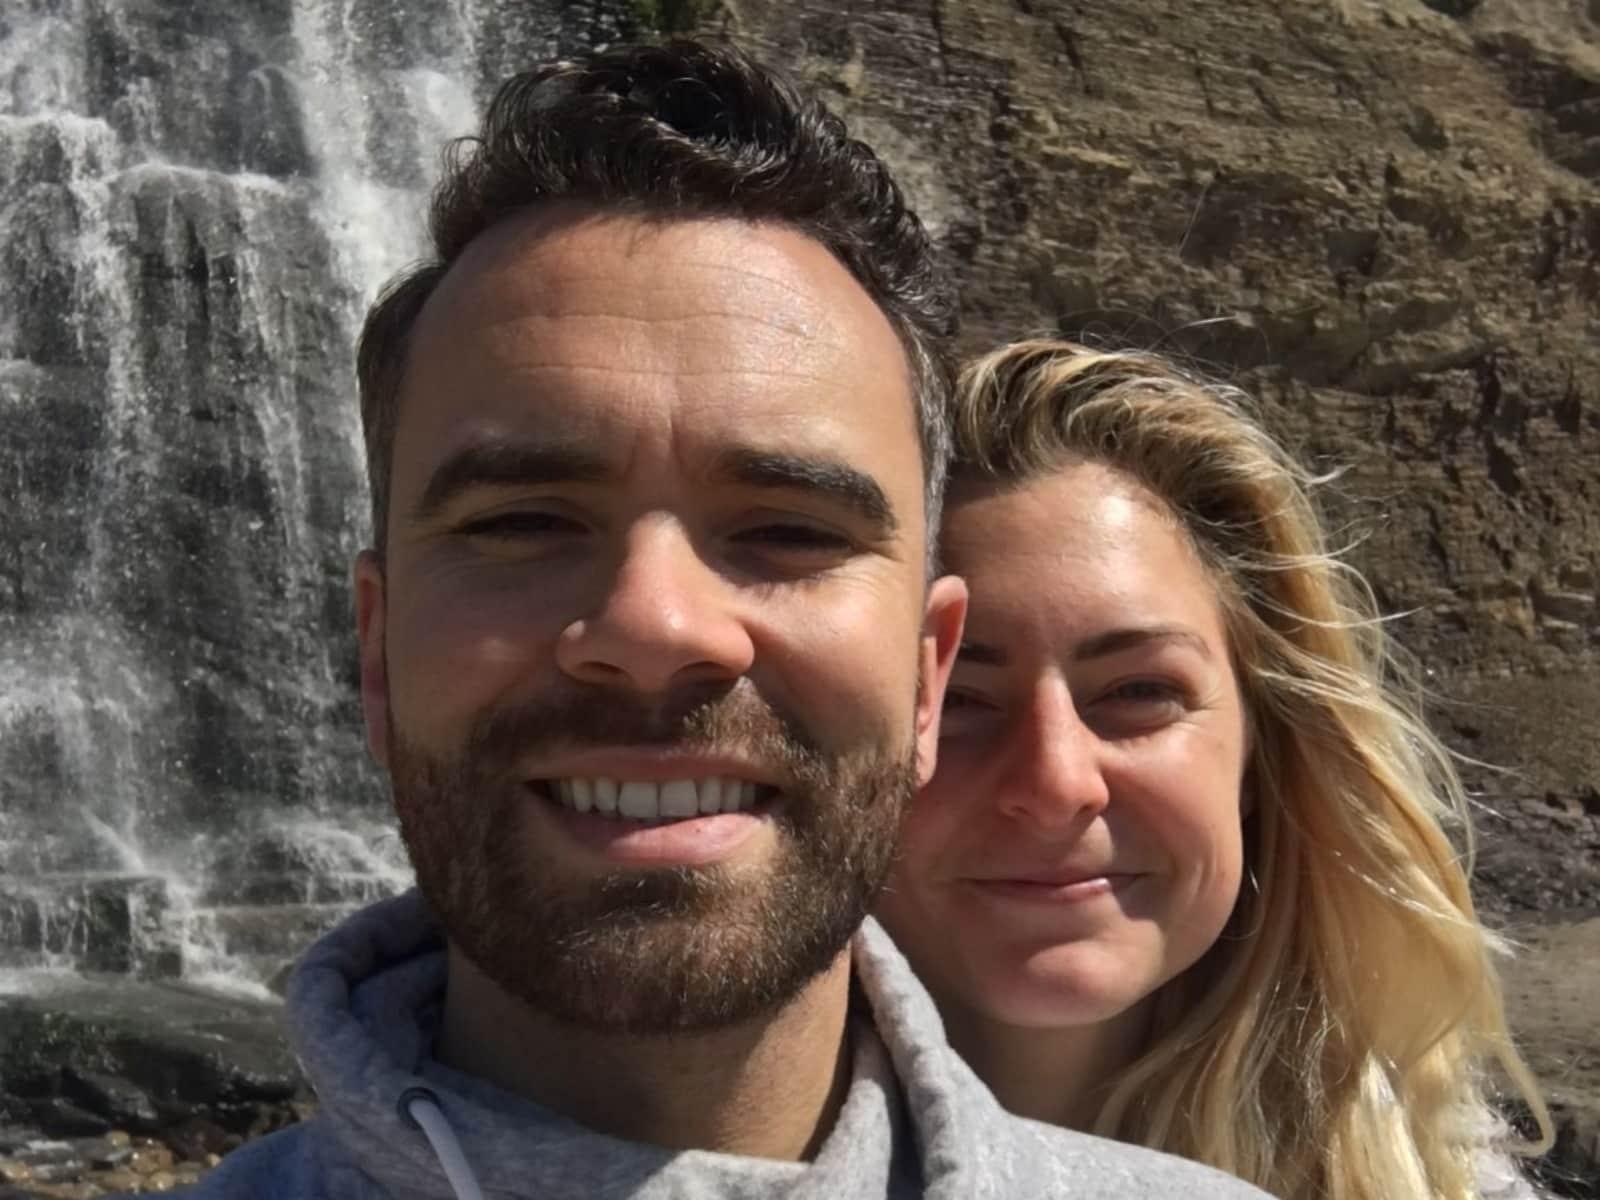 Josephine & Ryan from San Francisco, California, United States